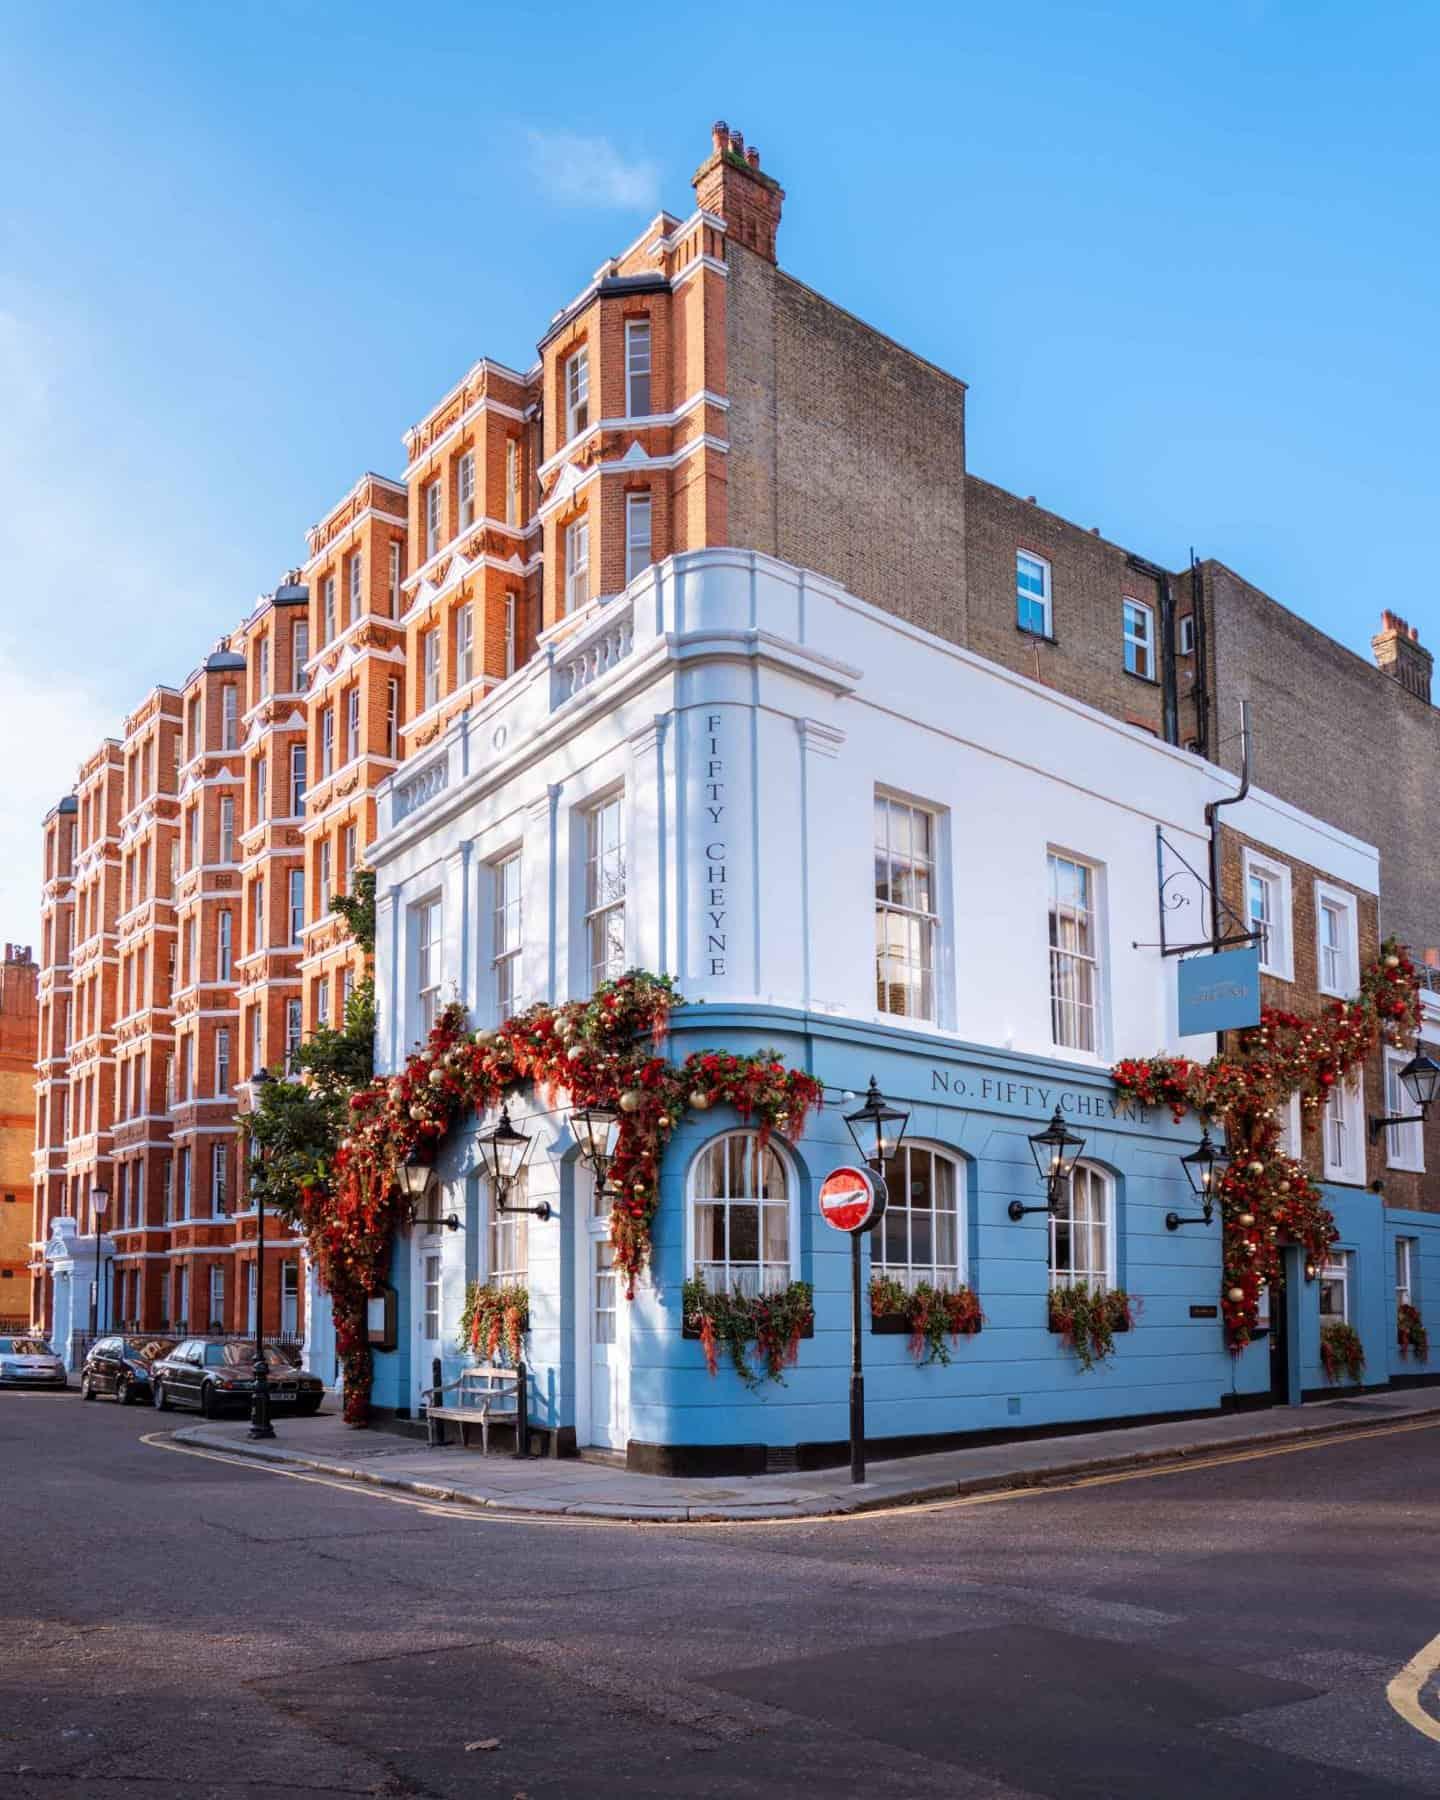 Fifty Cheyne restaurant on famous London street Cheyne Walk